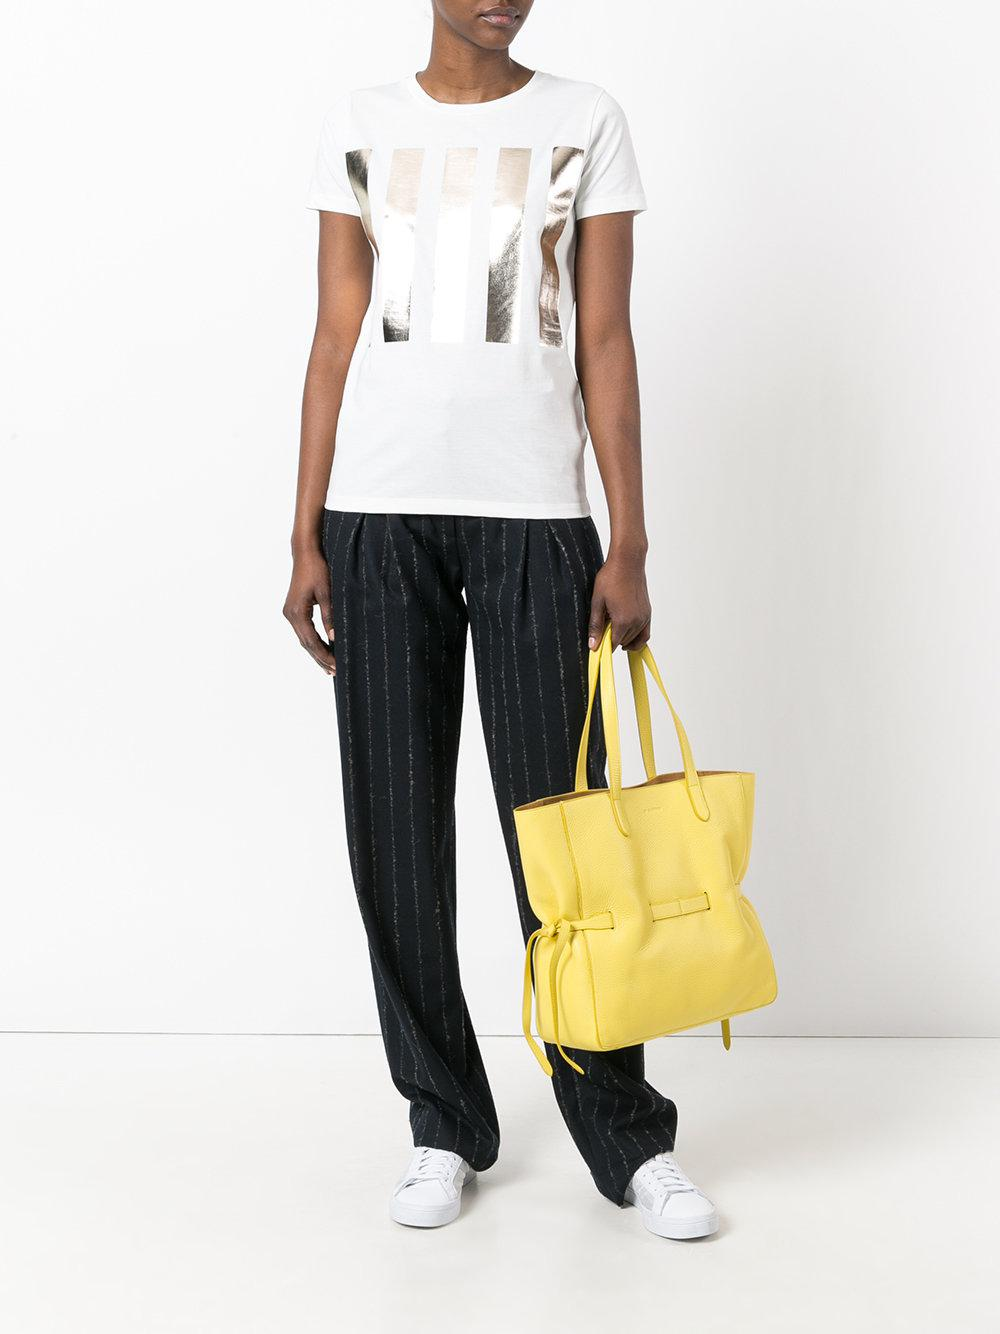 Jil Sander Leather Bucket Tote Bag in Yellow & Orange (Yellow)